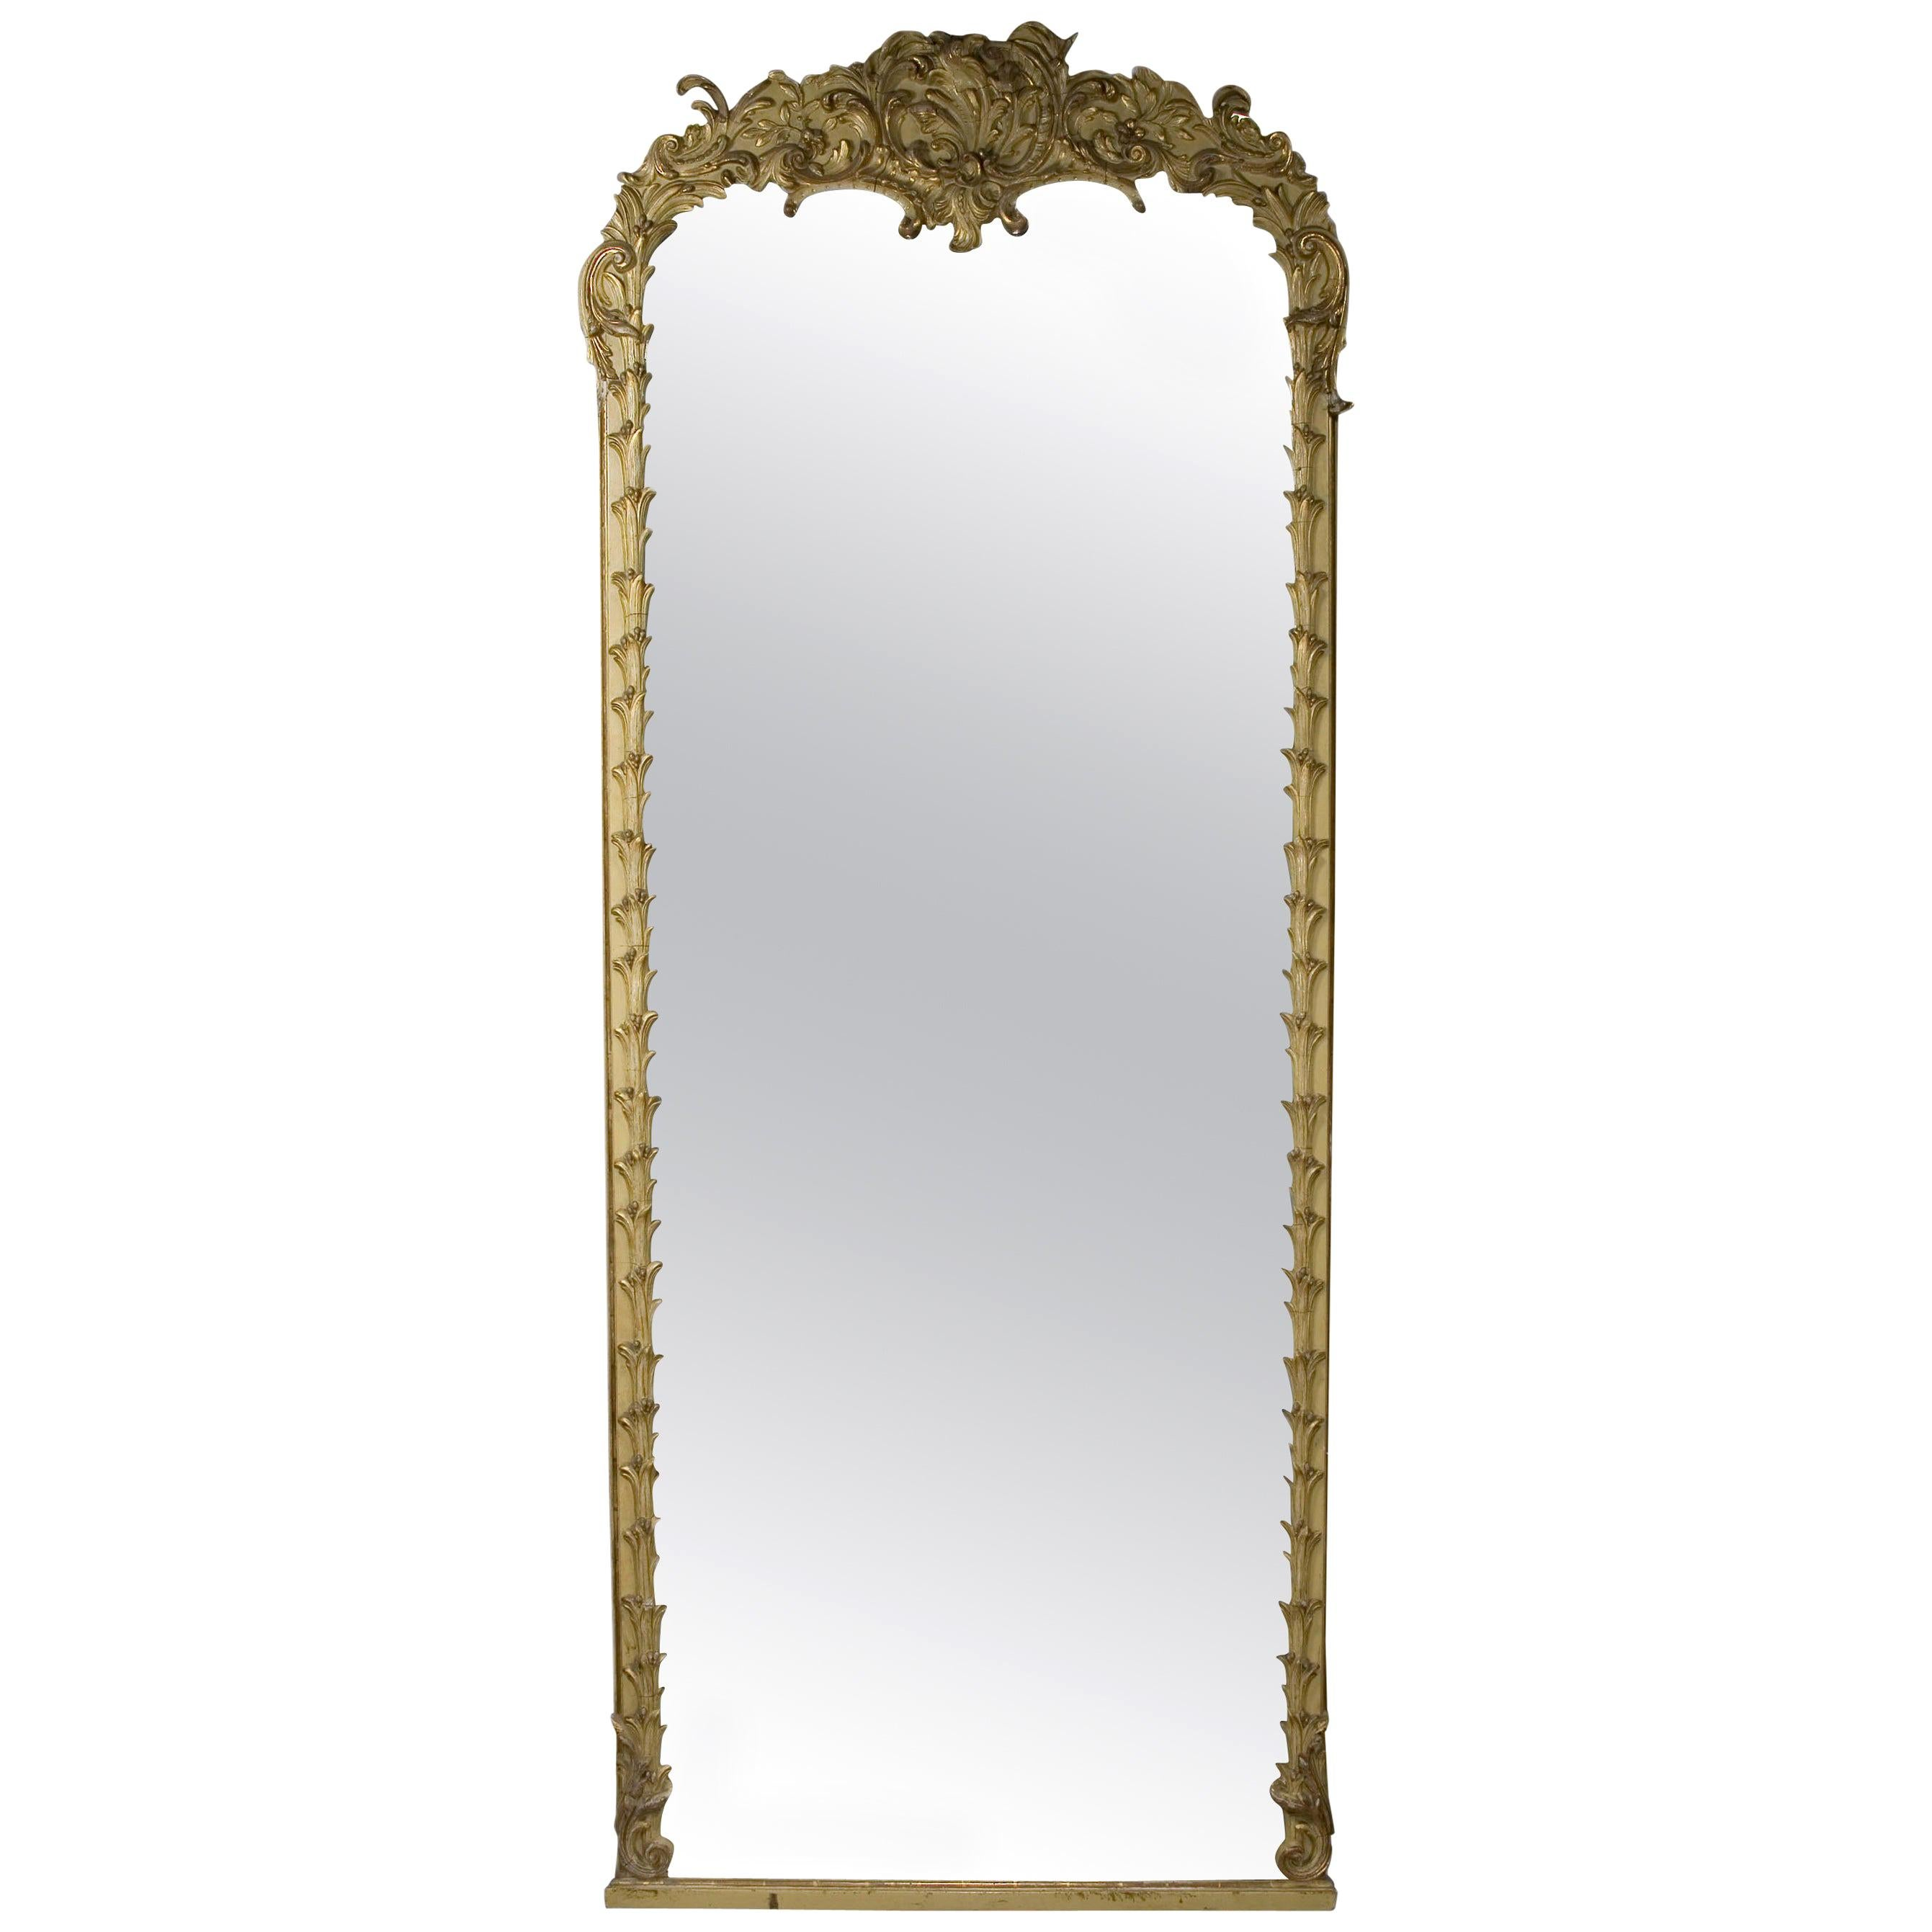 19th Century Monumental Baroque Style Mirror